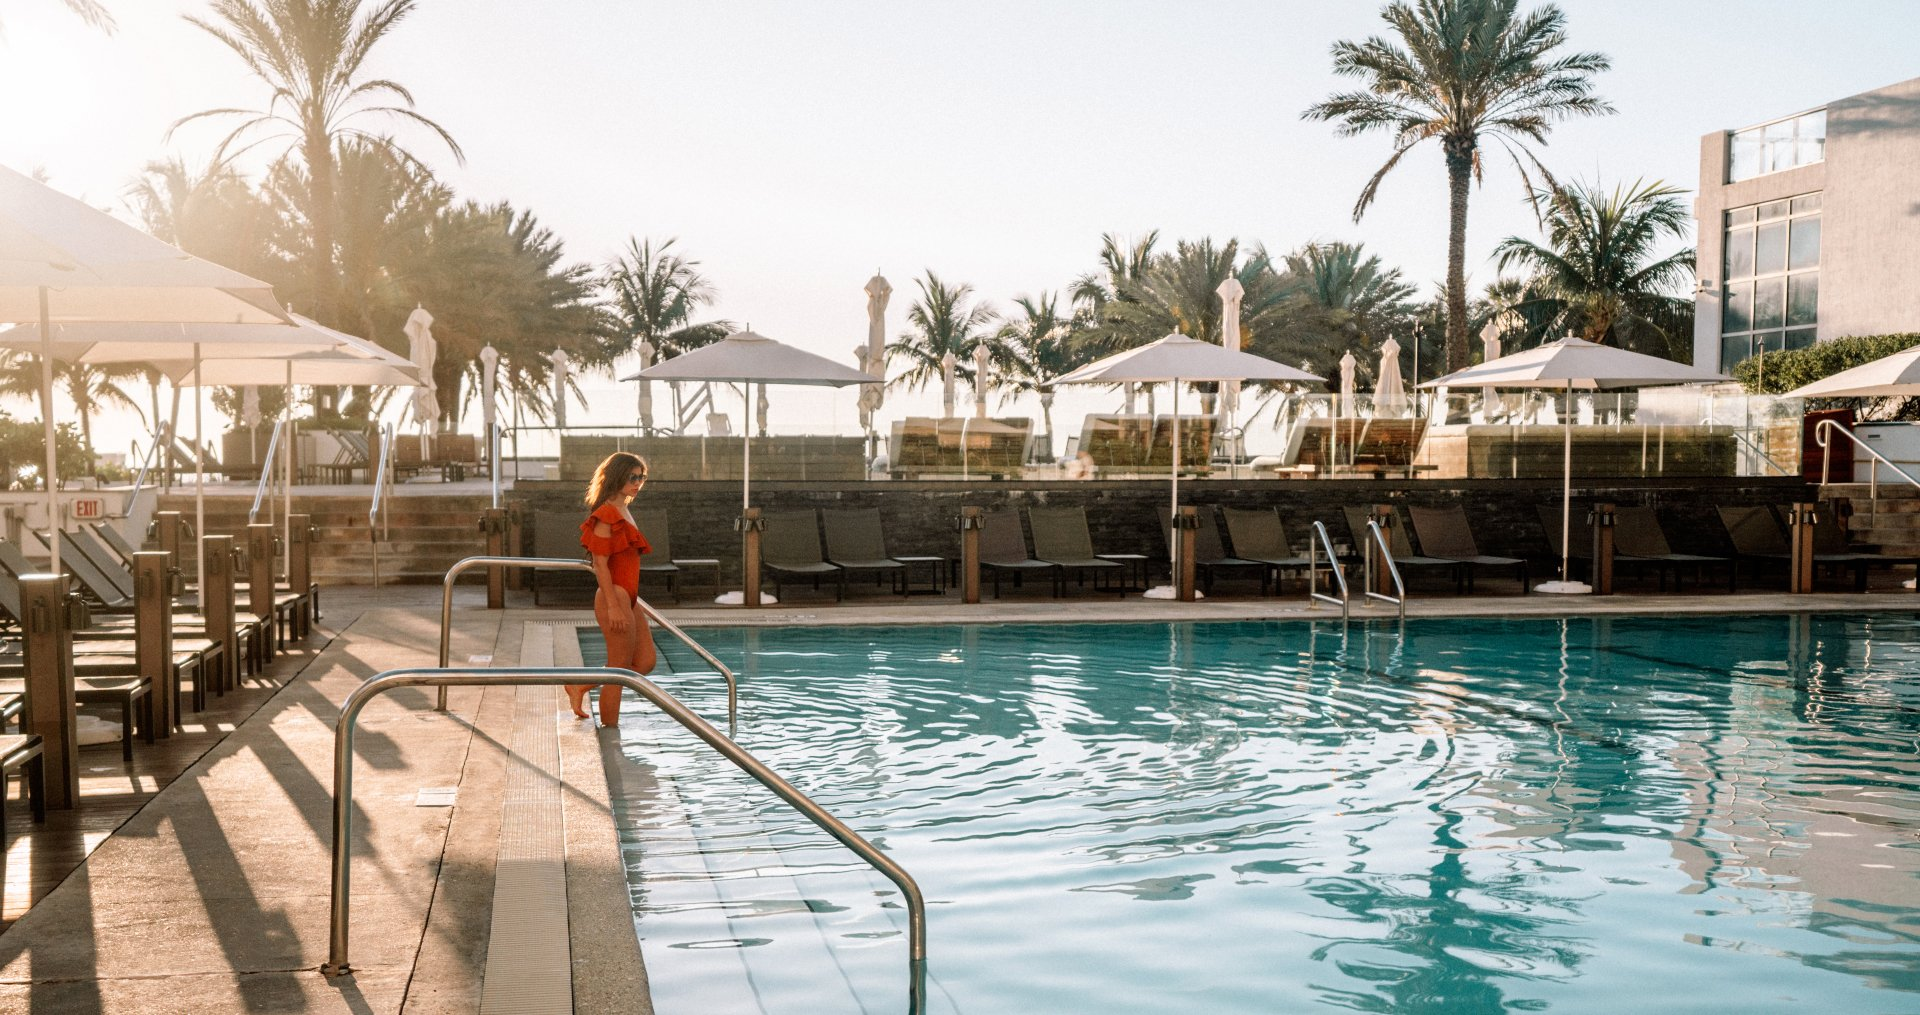 A woman entering the pool at Eden Roc, Miami Beach